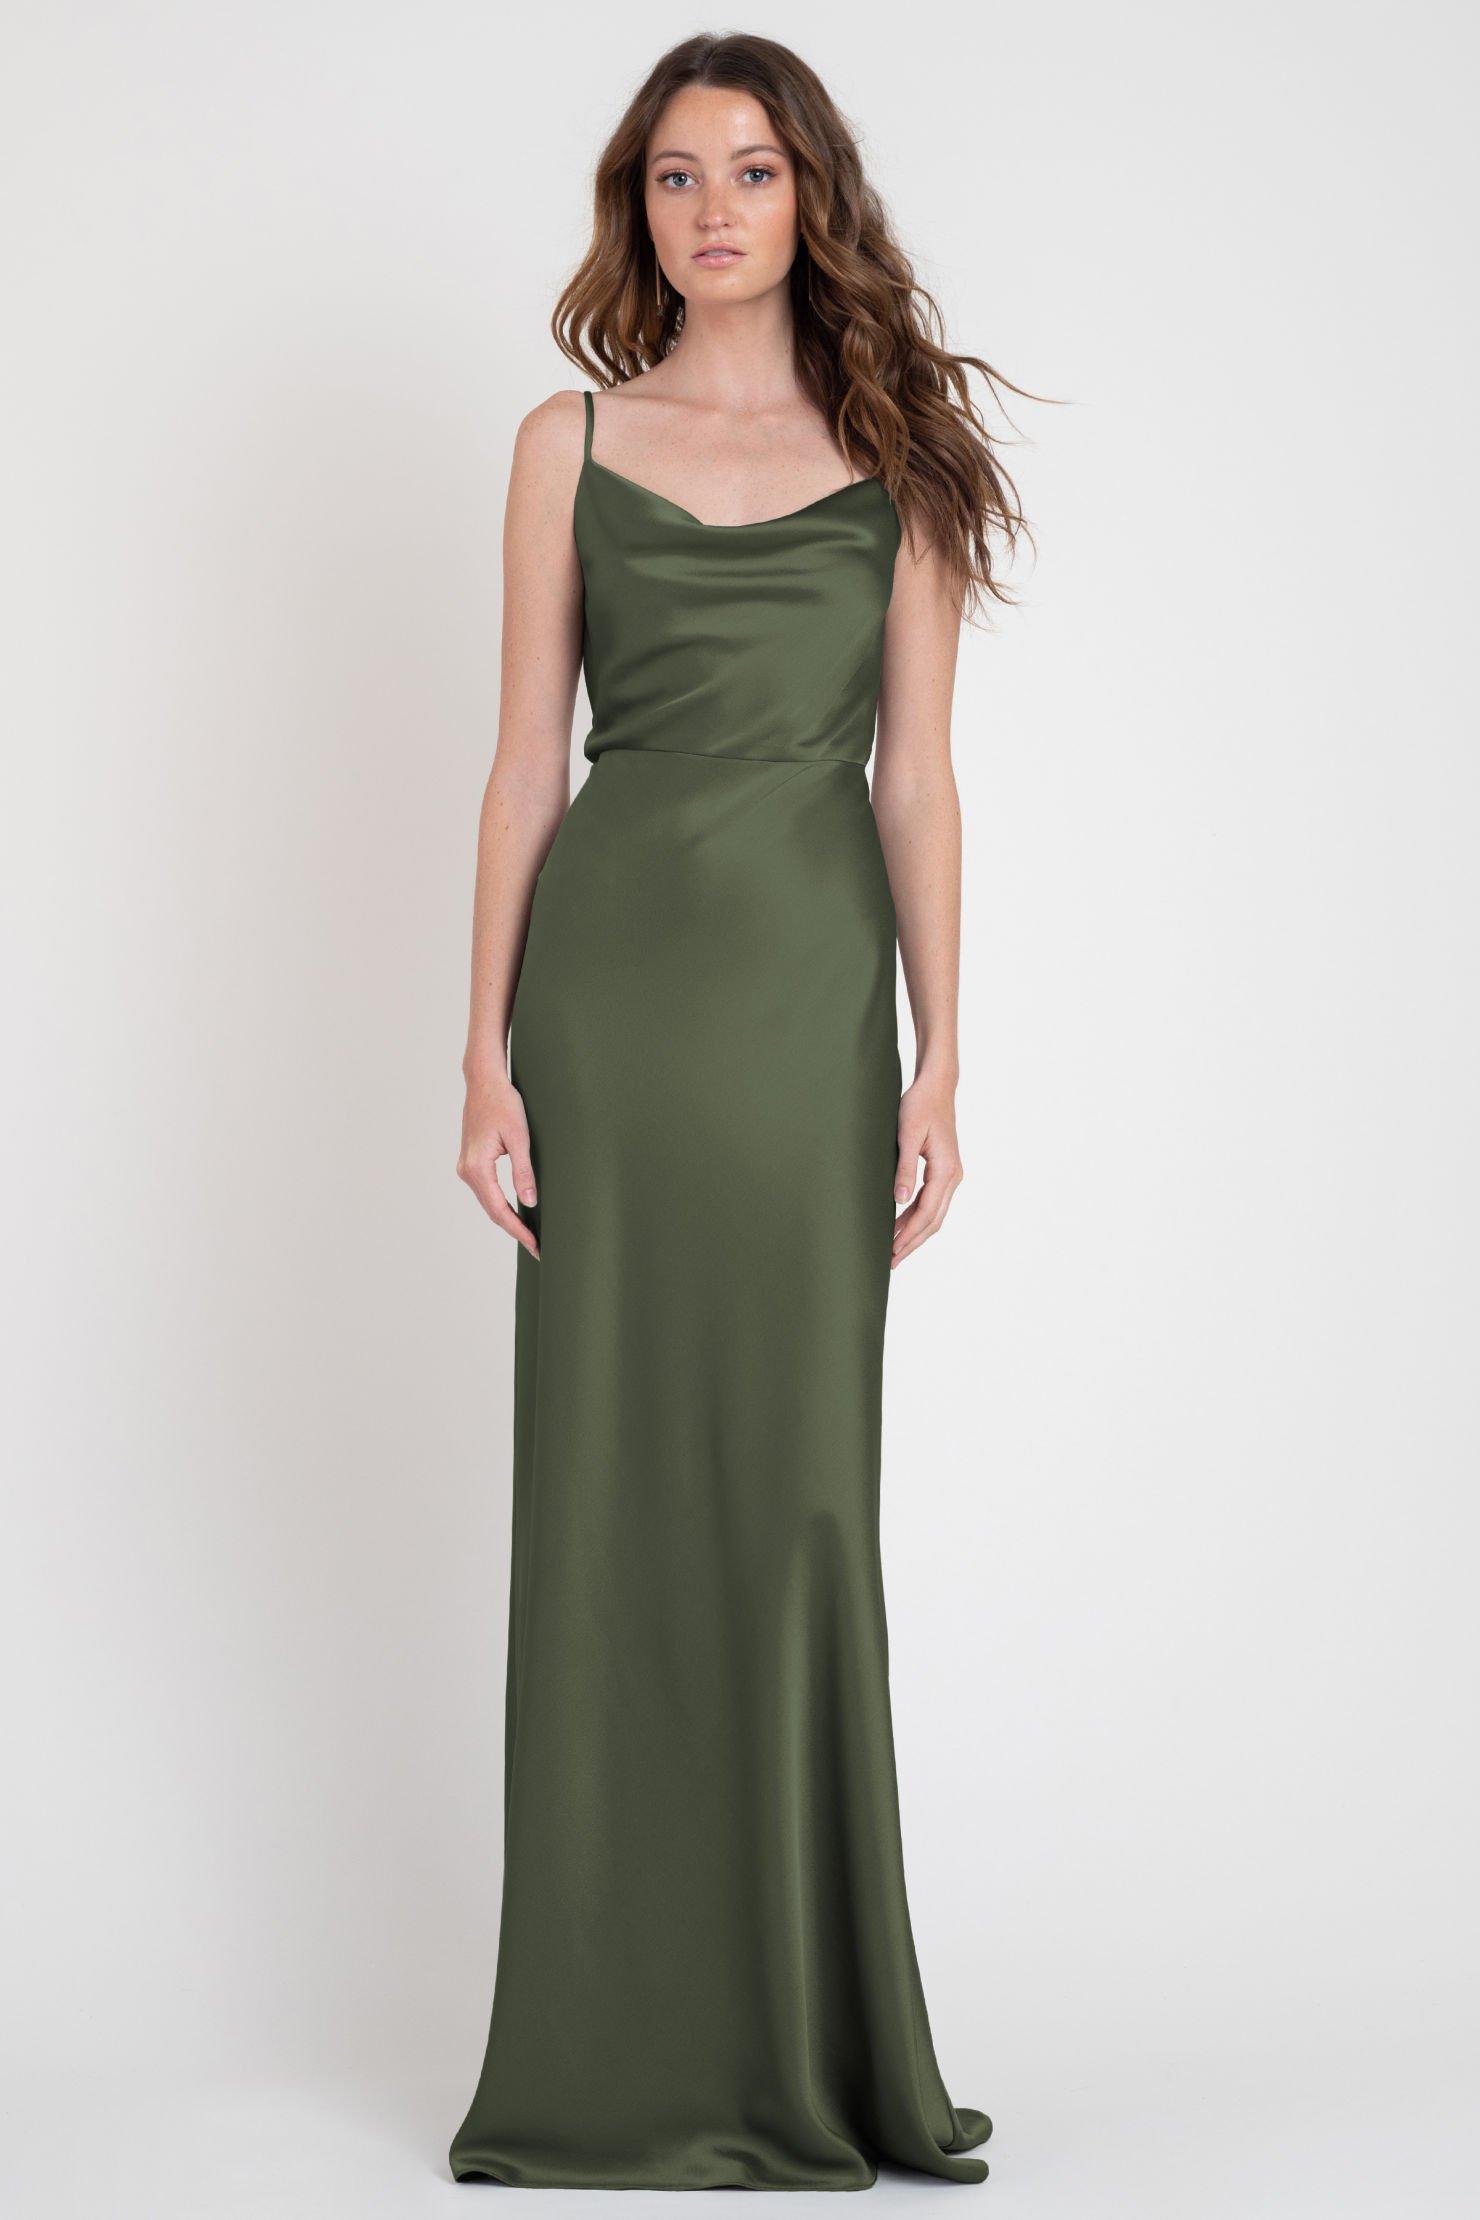 Sylvie Bridesmaids Dress by Jenny Yoo - Olive Green